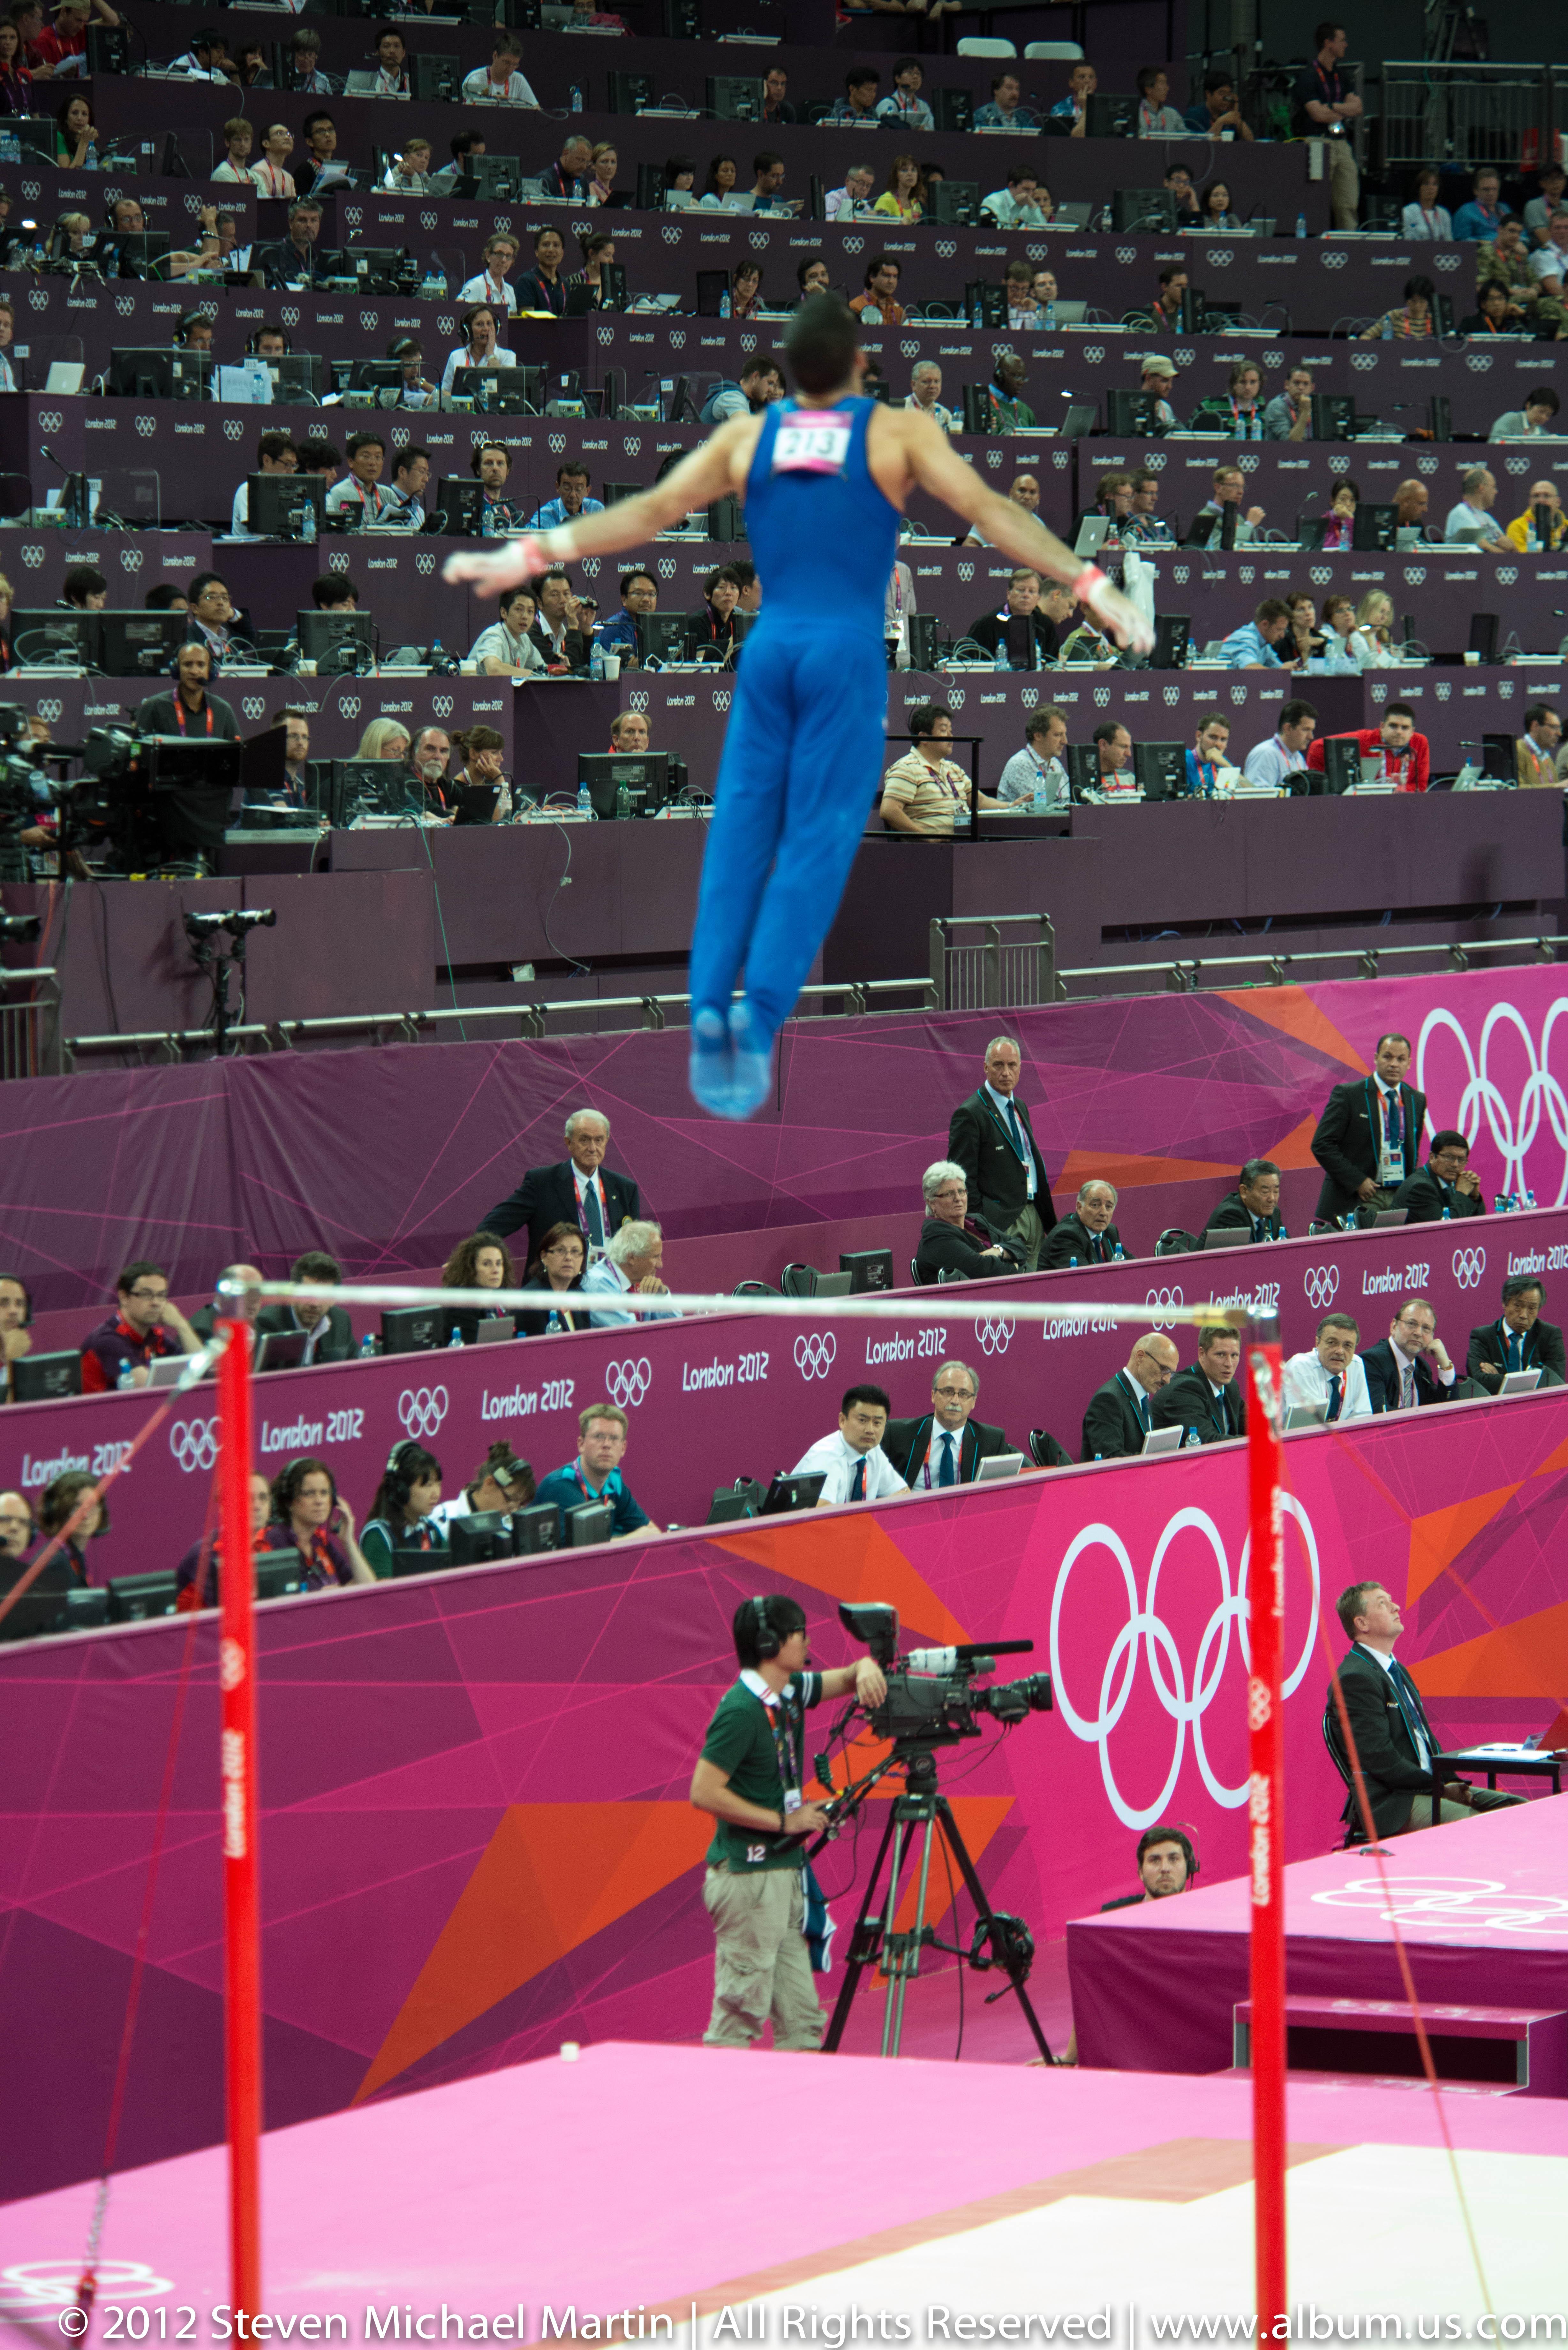 SMartin_2012 Olympics Gymastics_6327063